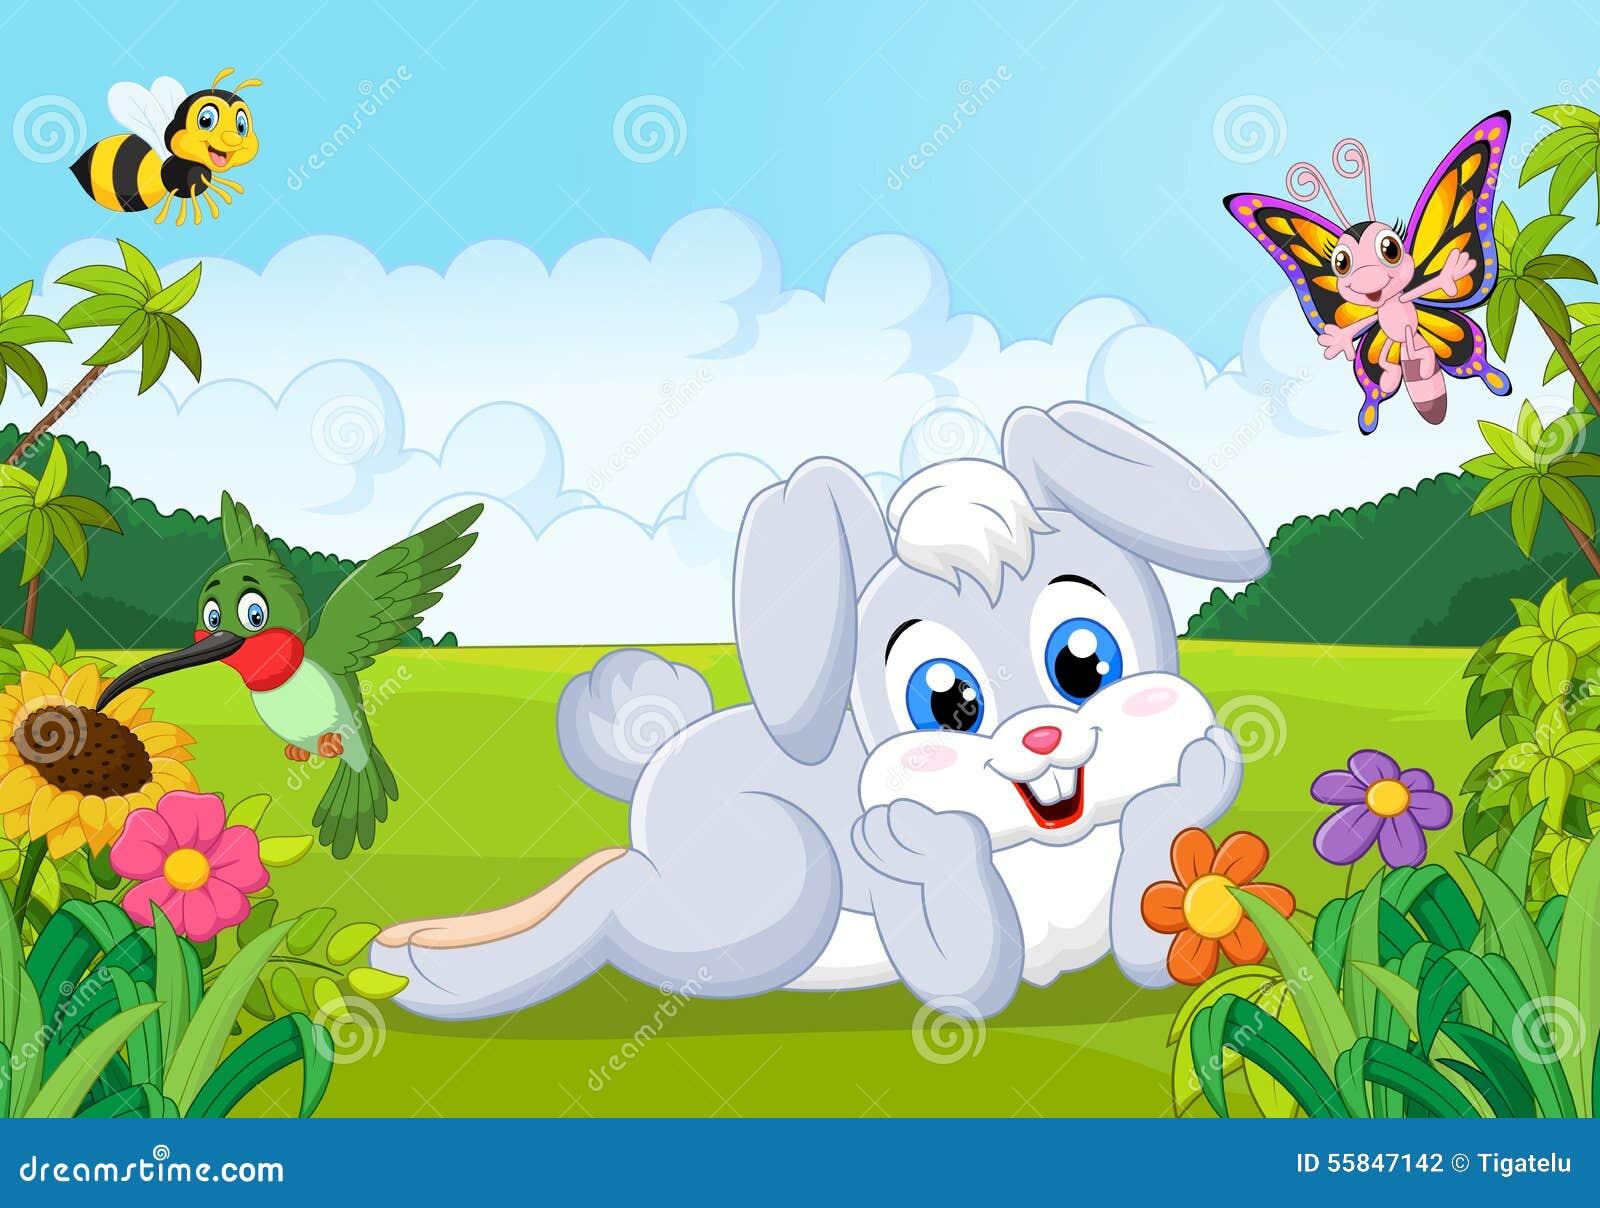 Cartoon Cute Bunny In The Jungle Stock Vector Image